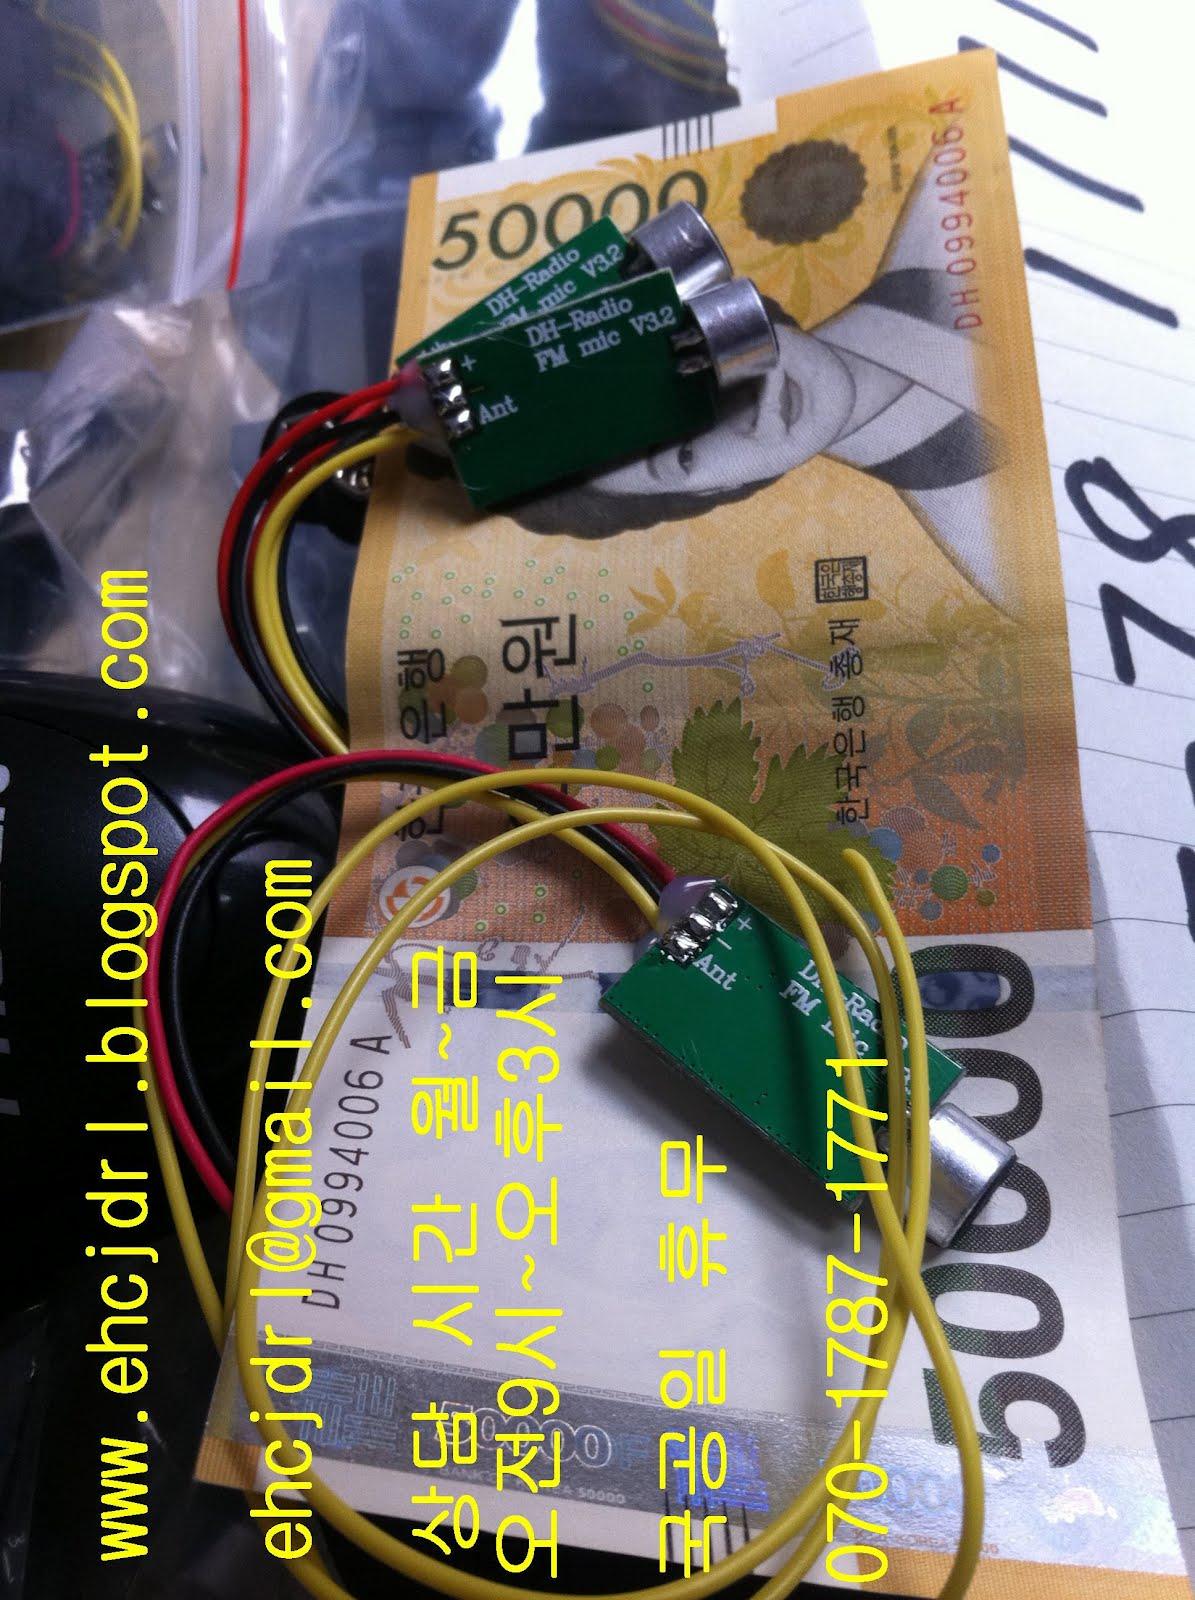 25f9b777dc9 초소형 무선 도청기 실시간 1대1 상담: 초소형 무선 도청기 판매 합니다